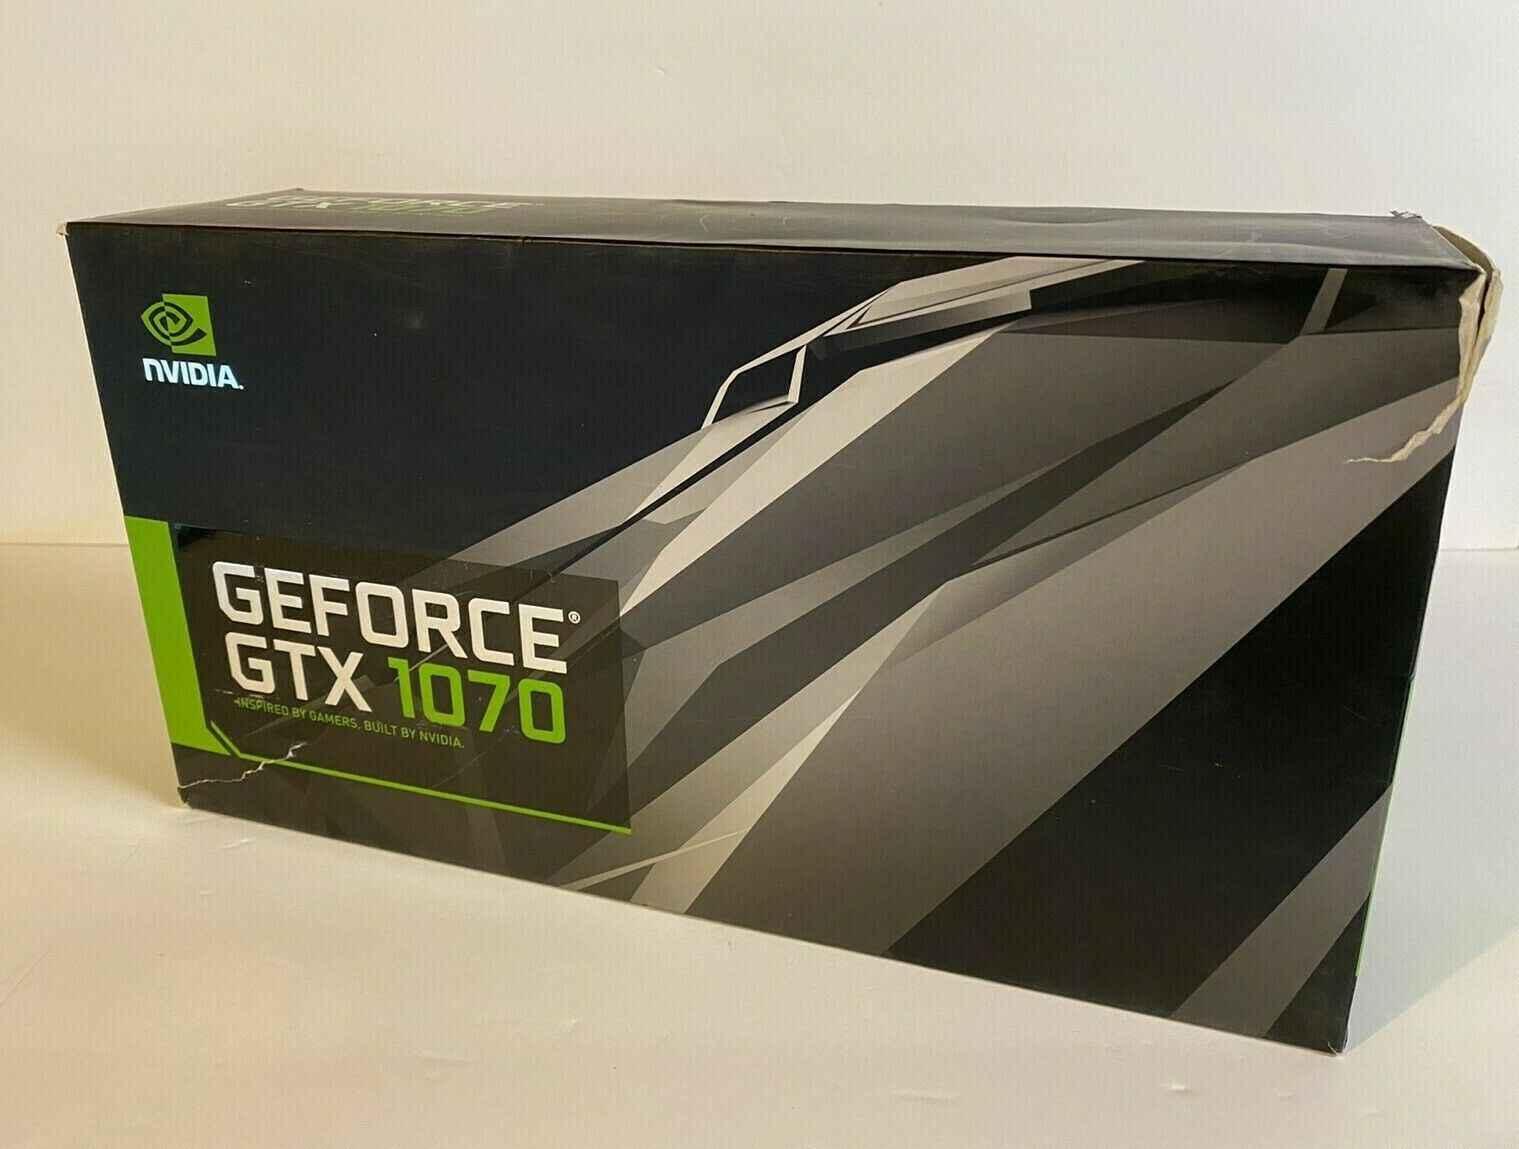 NVIDIA GeForce GTX 1070 Founders Edition 8GB GDDR5 Graphics Card GPU Bemowo - zdjęcie 3